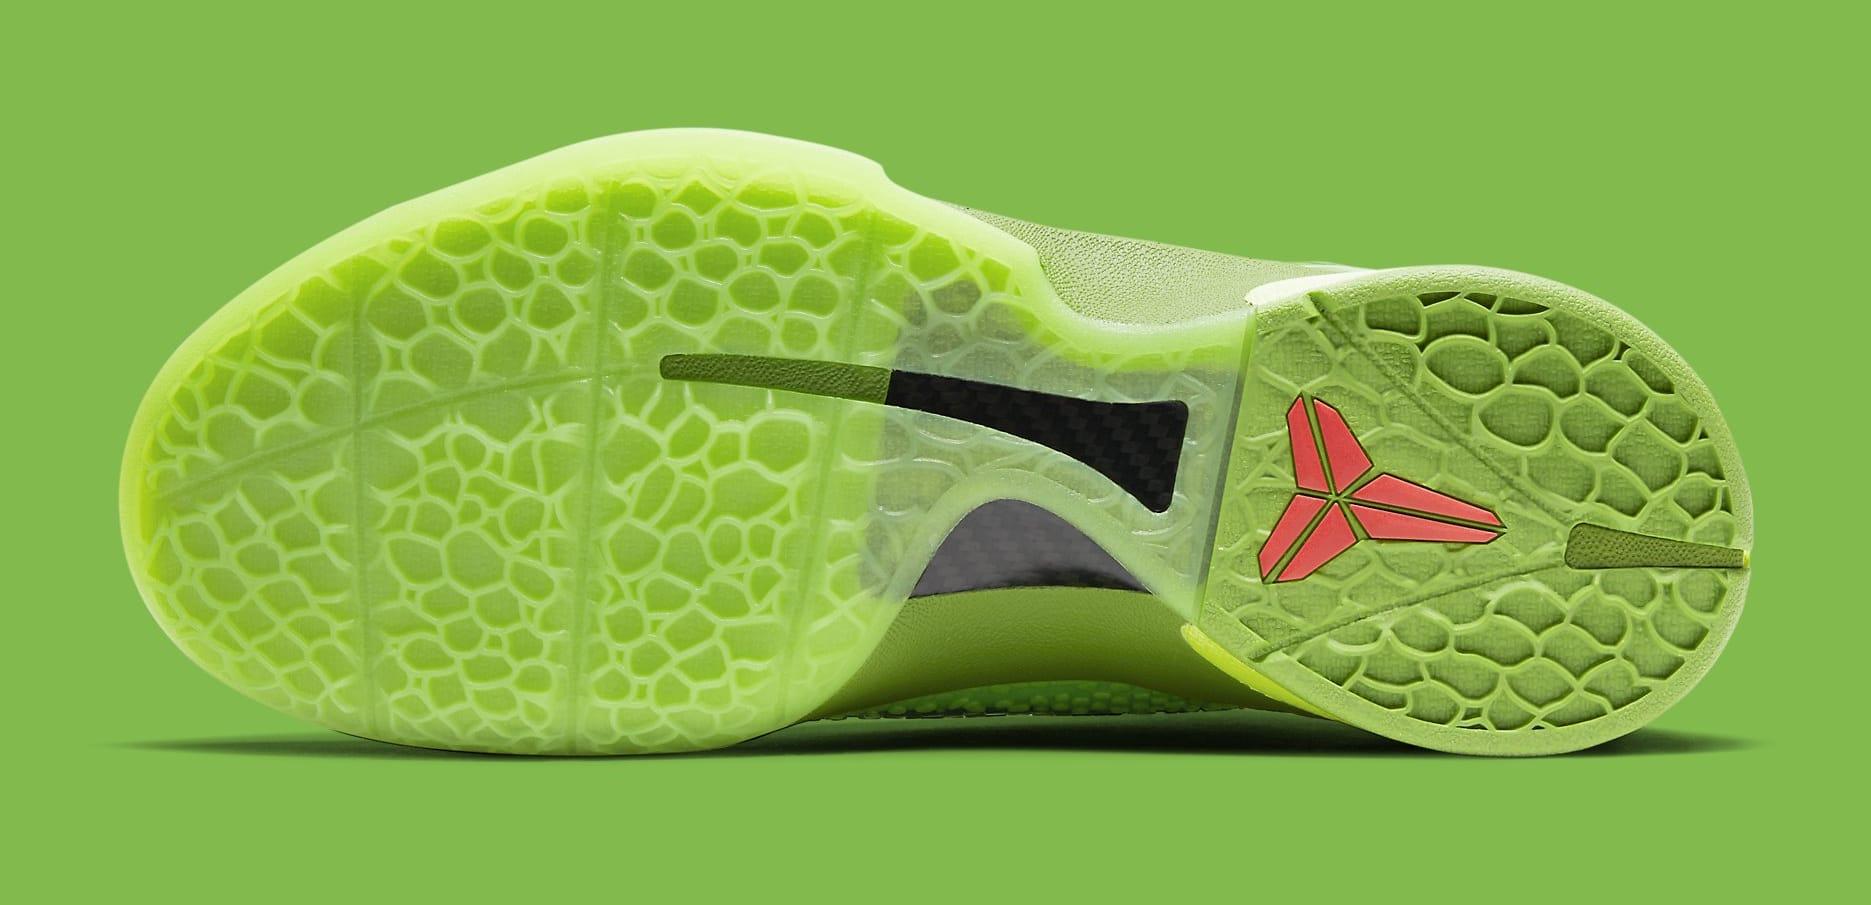 Nike Kobe 6 Protro 'Grinch' CW2190-300 Outsole